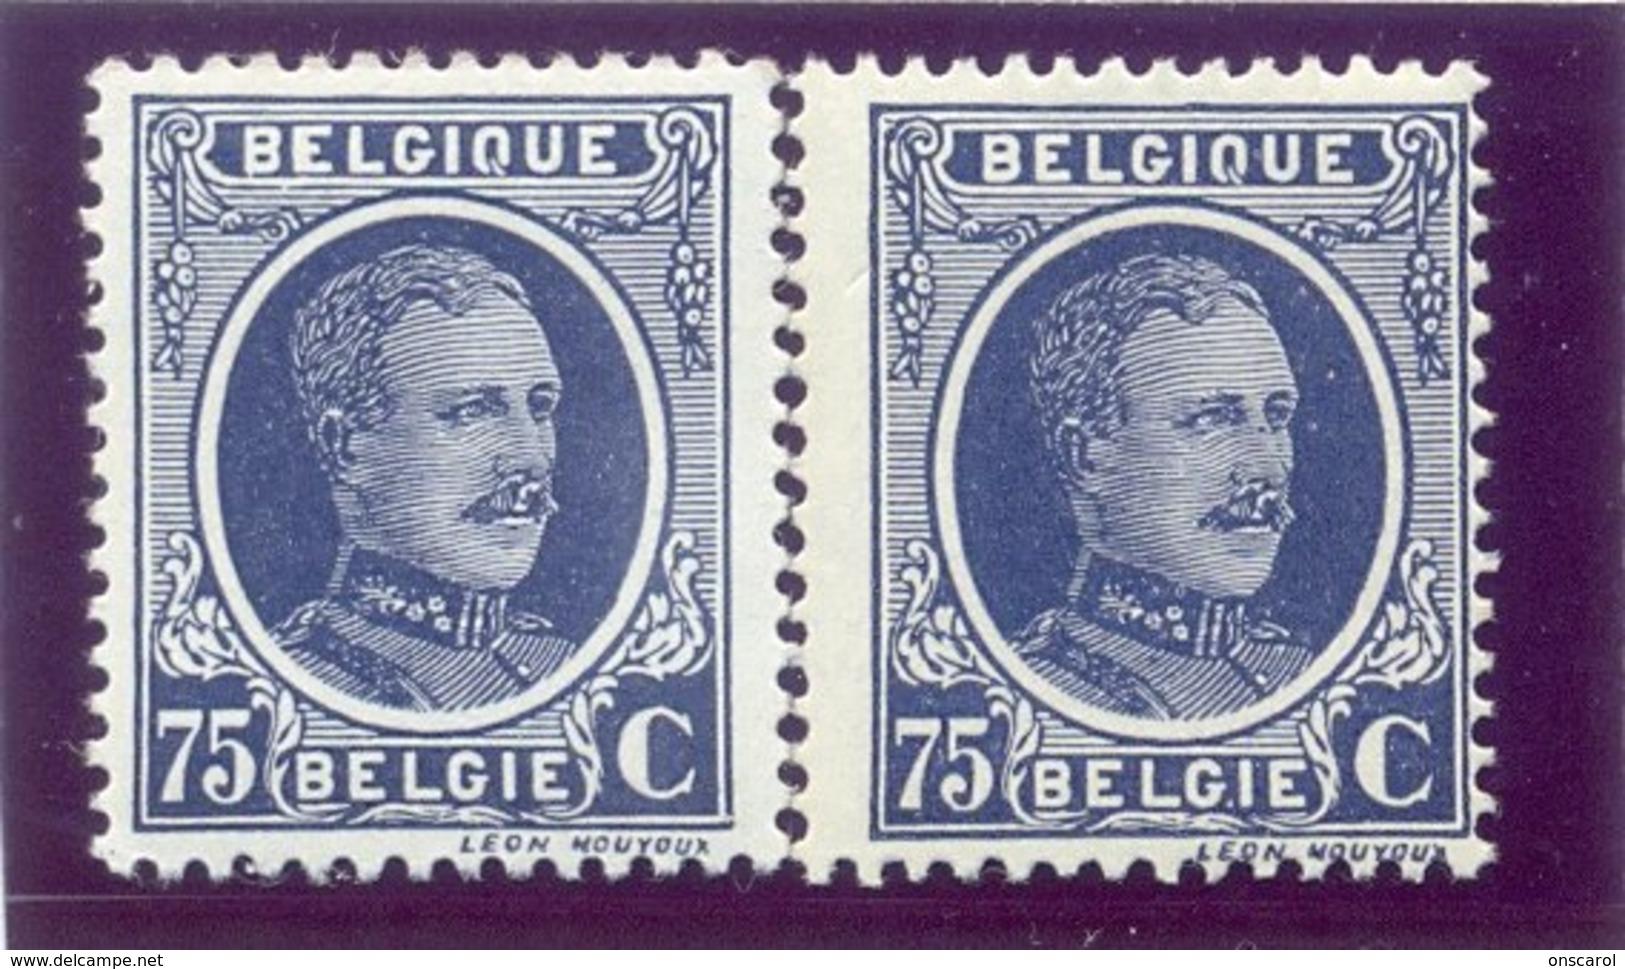 Nr. 204 -V2 Eerste E Dik In Belgique Postgaaf ** MNH Zeer Mooi - Variétés (Catalogue COB)